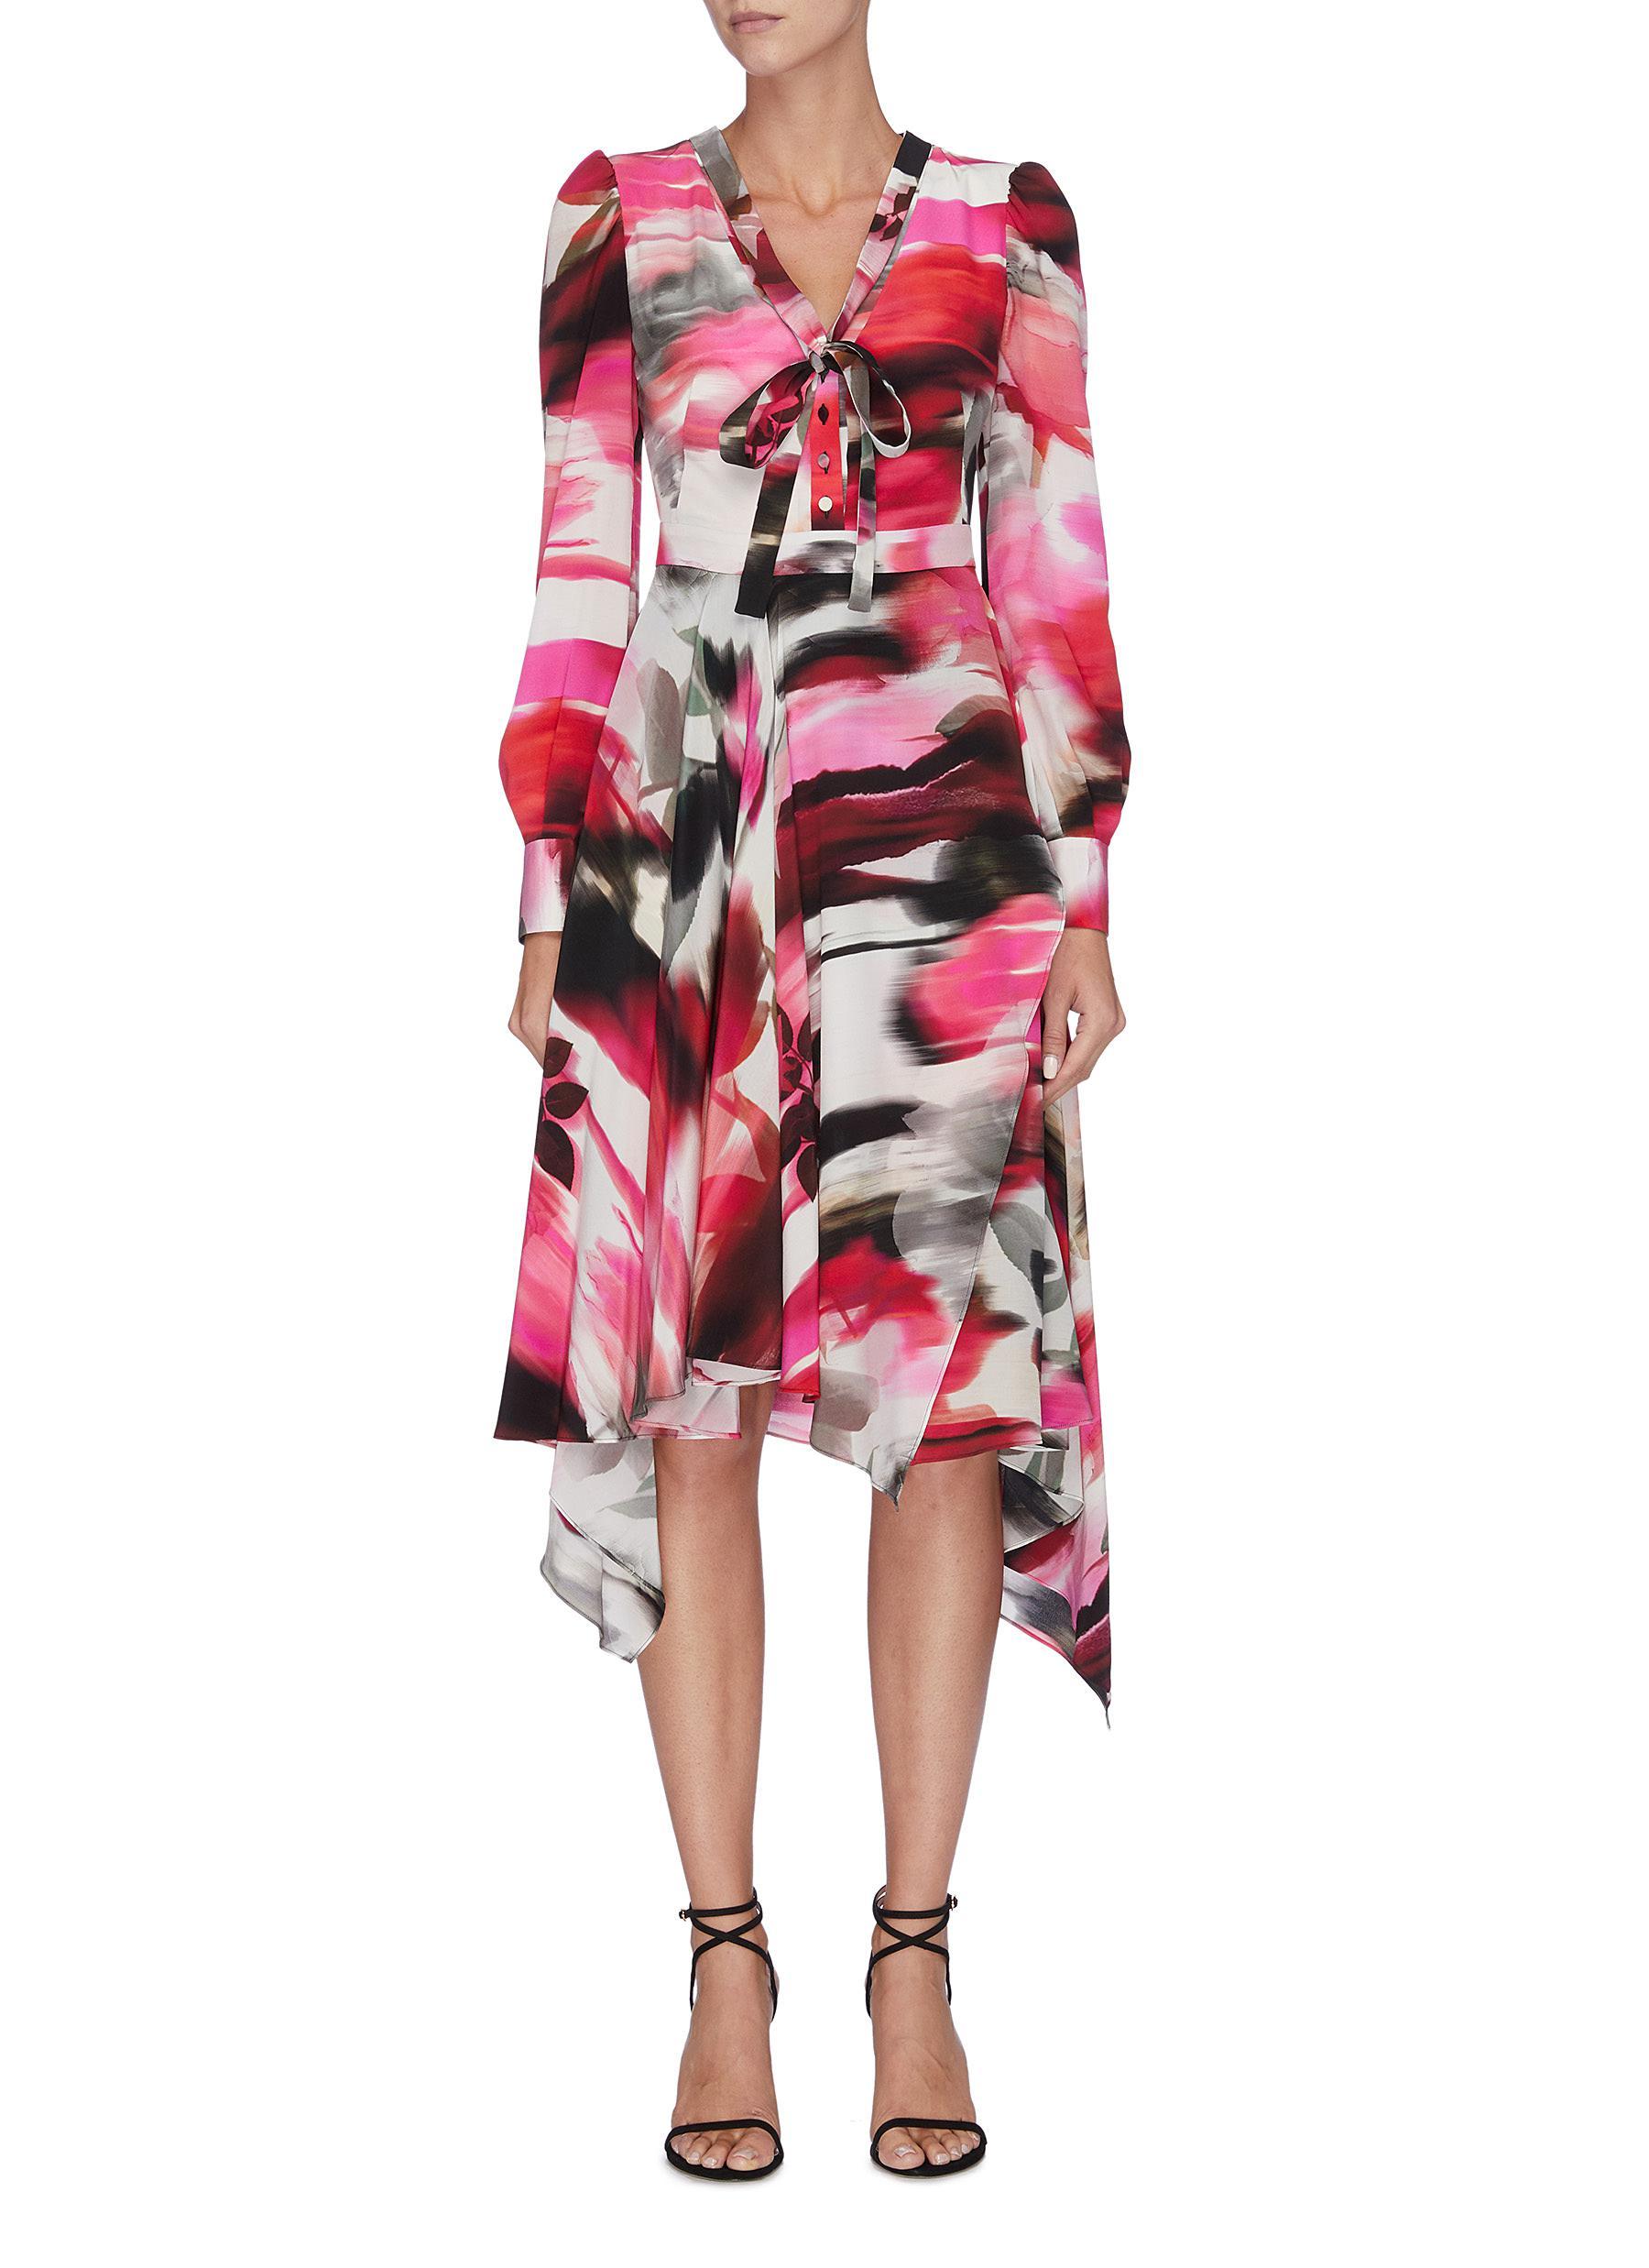 Sash neck tie rose print asymmetric silk dress by Alexander Mcqueen